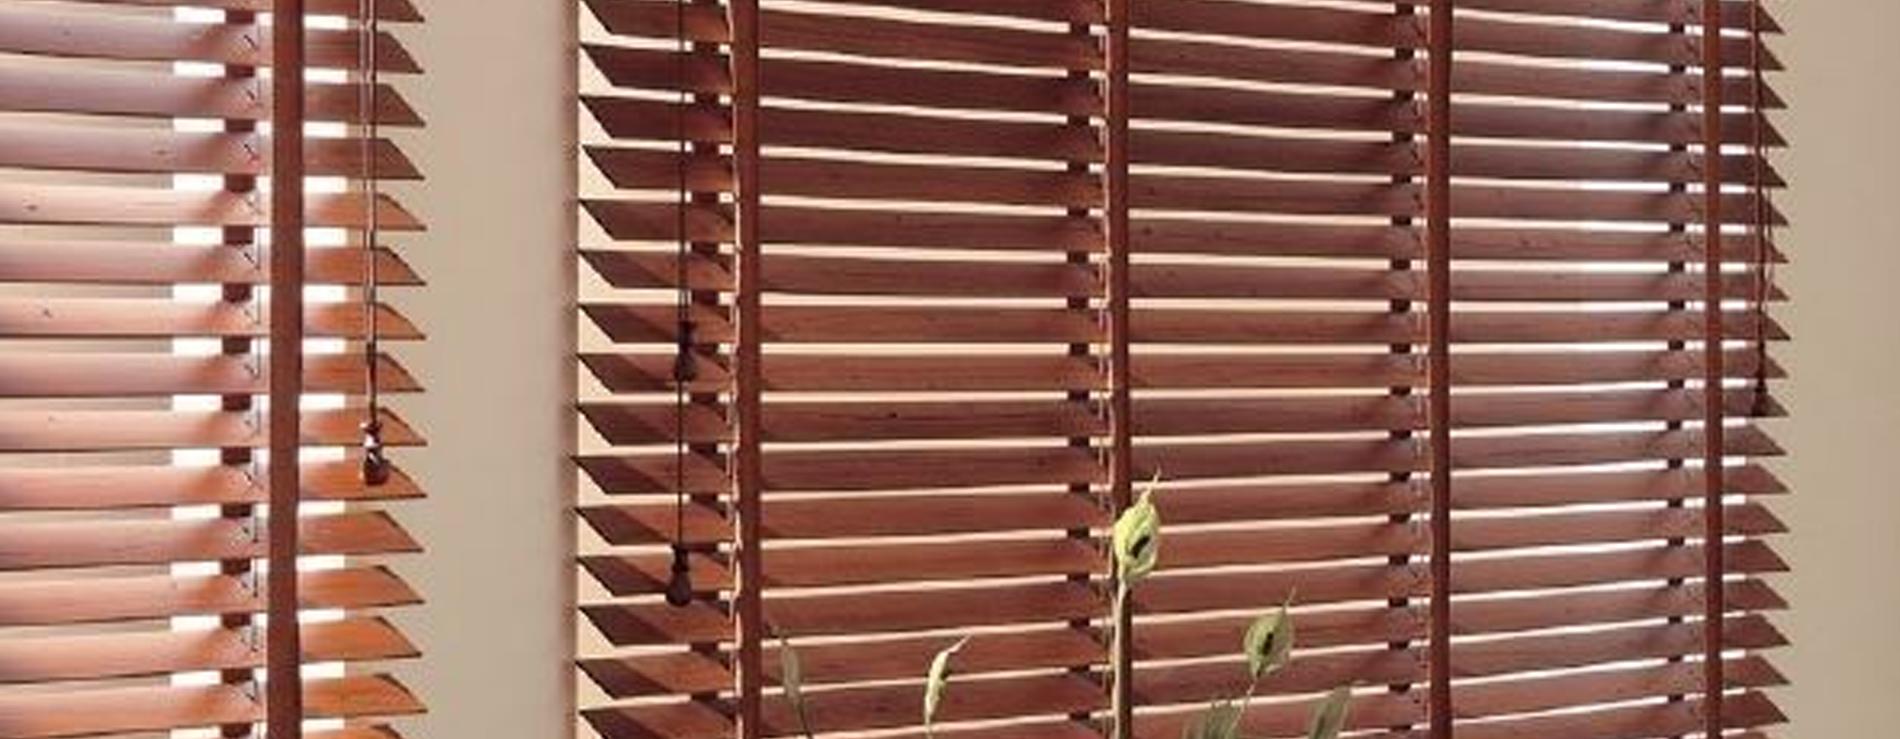 Veneziane in legno mottura centro mobili - Veneziane da esterno leroy merlin ...